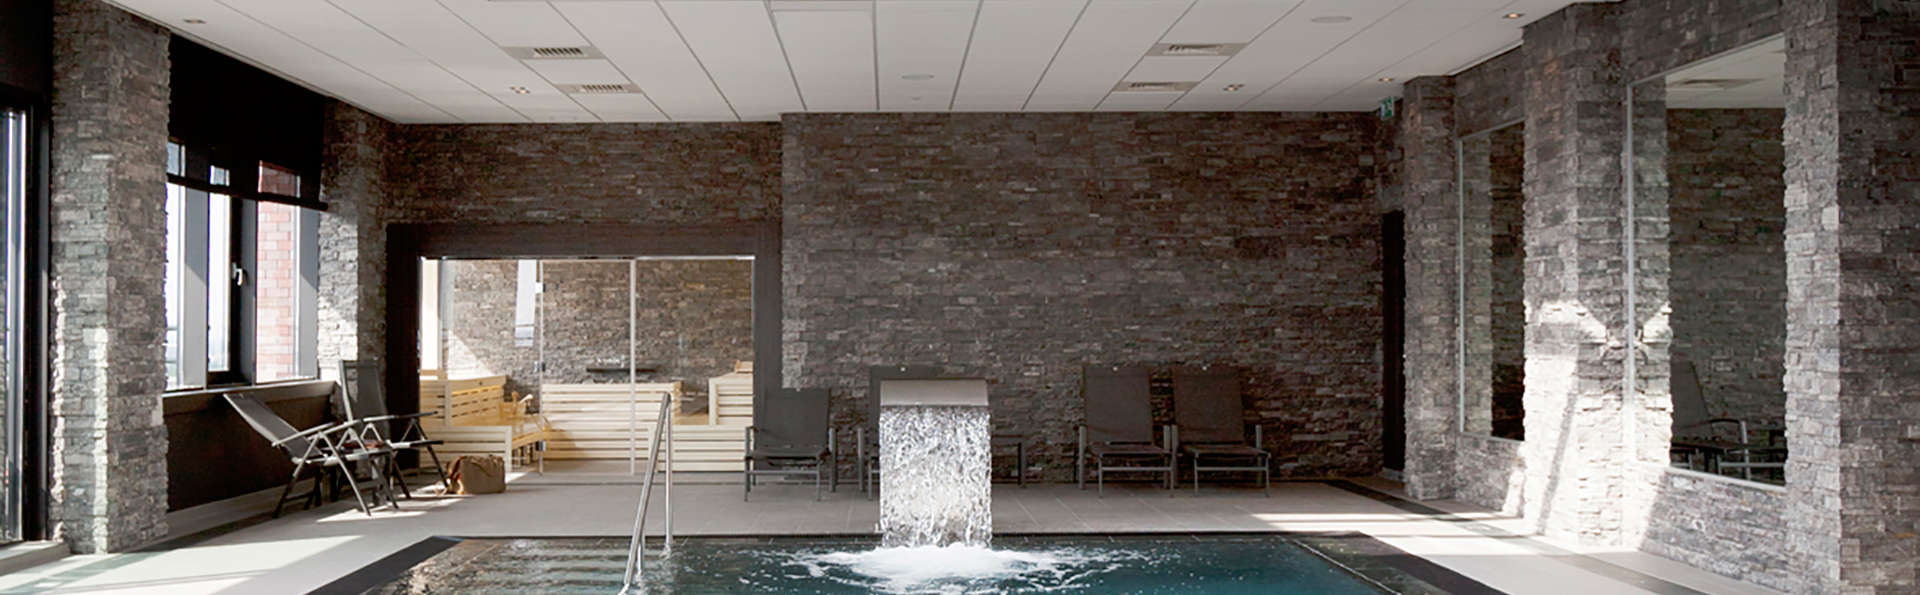 Van der Valk hotel Dordrecht - edit_Wellness__05__-_Copy.jpg